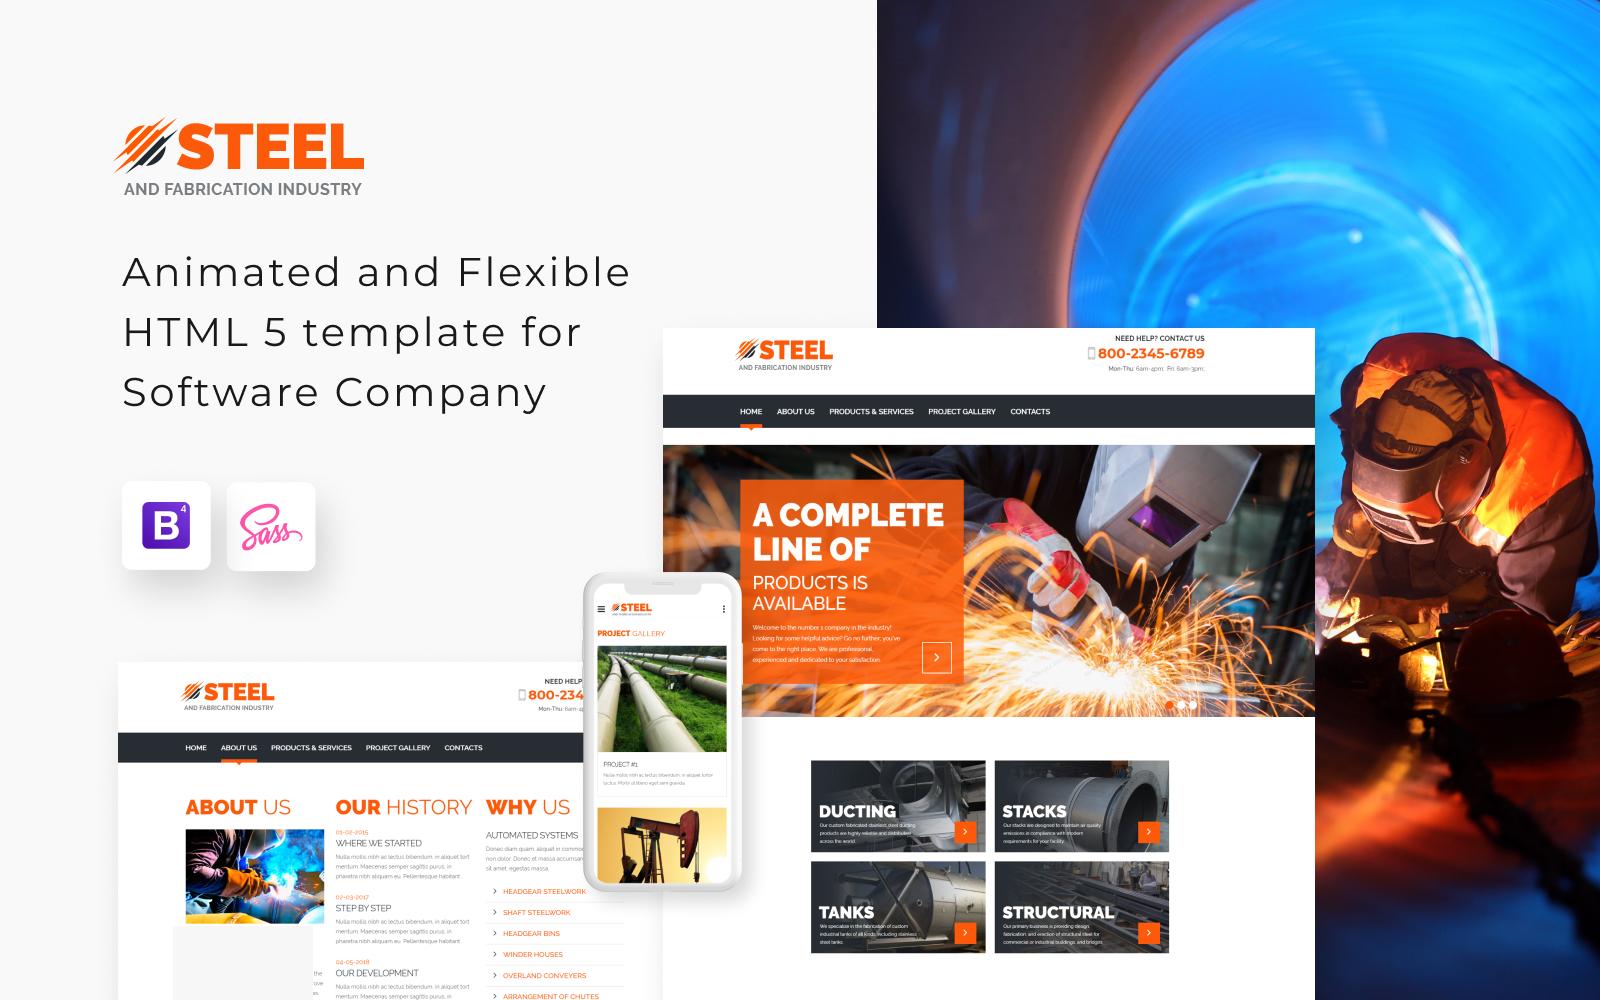 Steel - Metal Fabrication Industry Template Web №55571 - screenshot